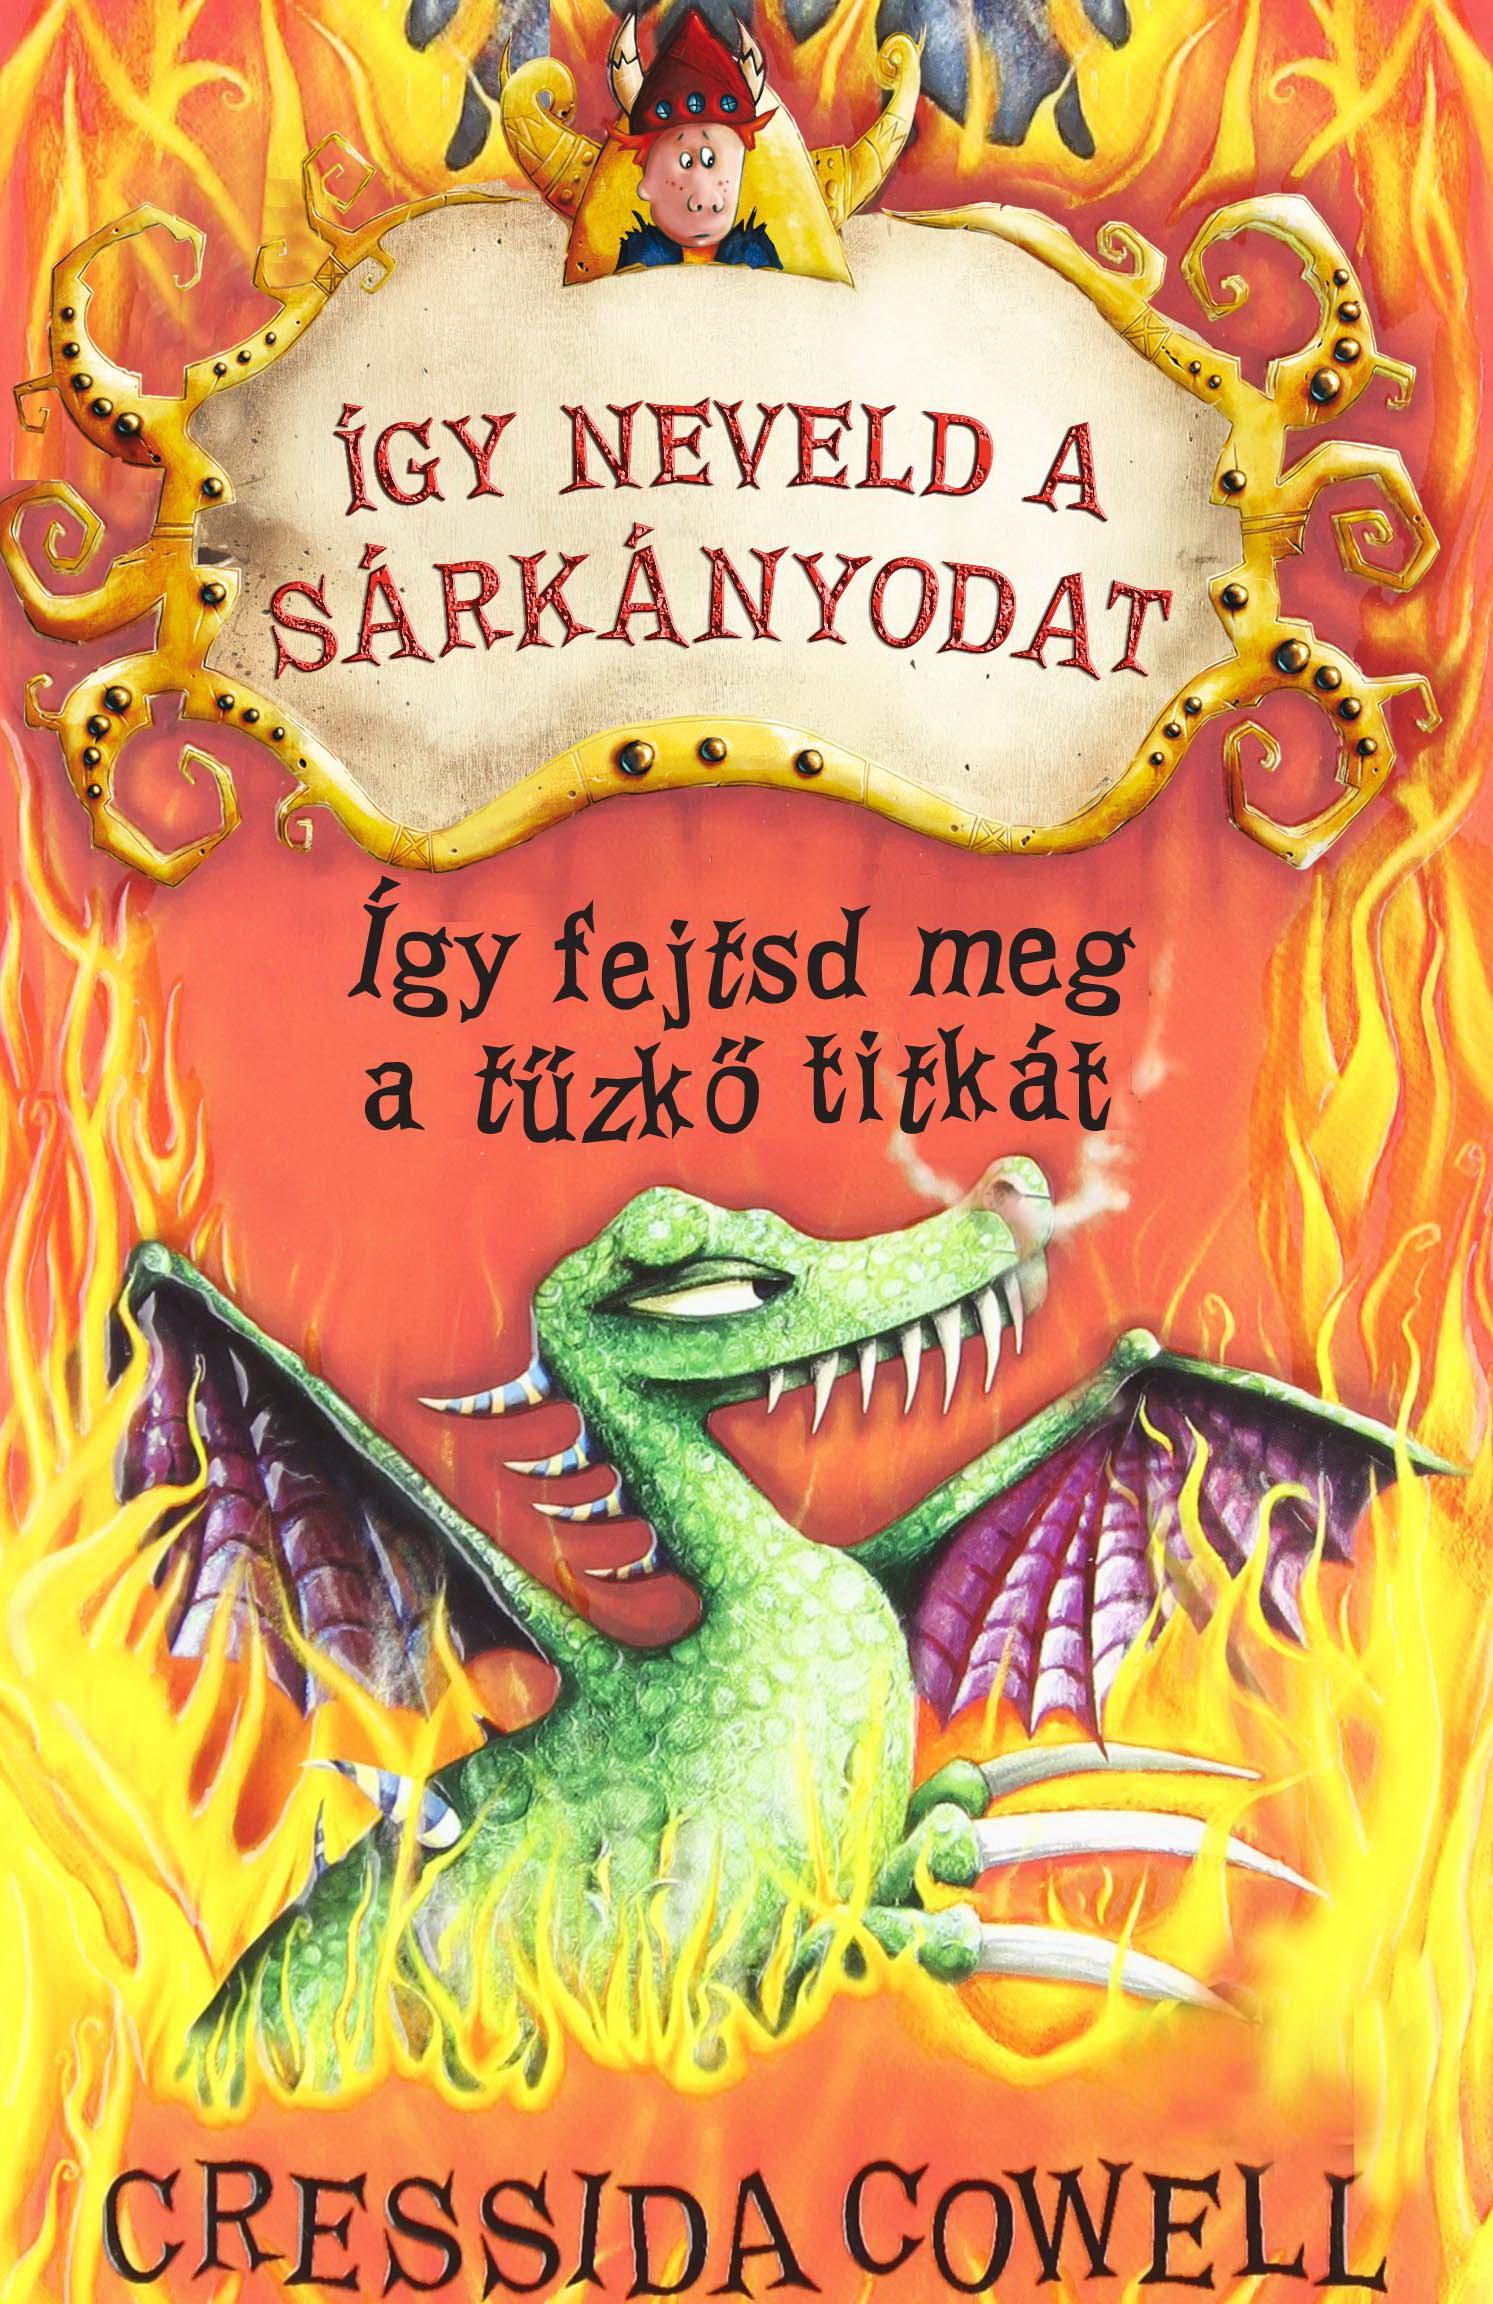 ÍGY FEJTSD MEG A TŰZKŐ TITKÁT - ÍGY NEVELD A SÁRKÁNYODAT 5.